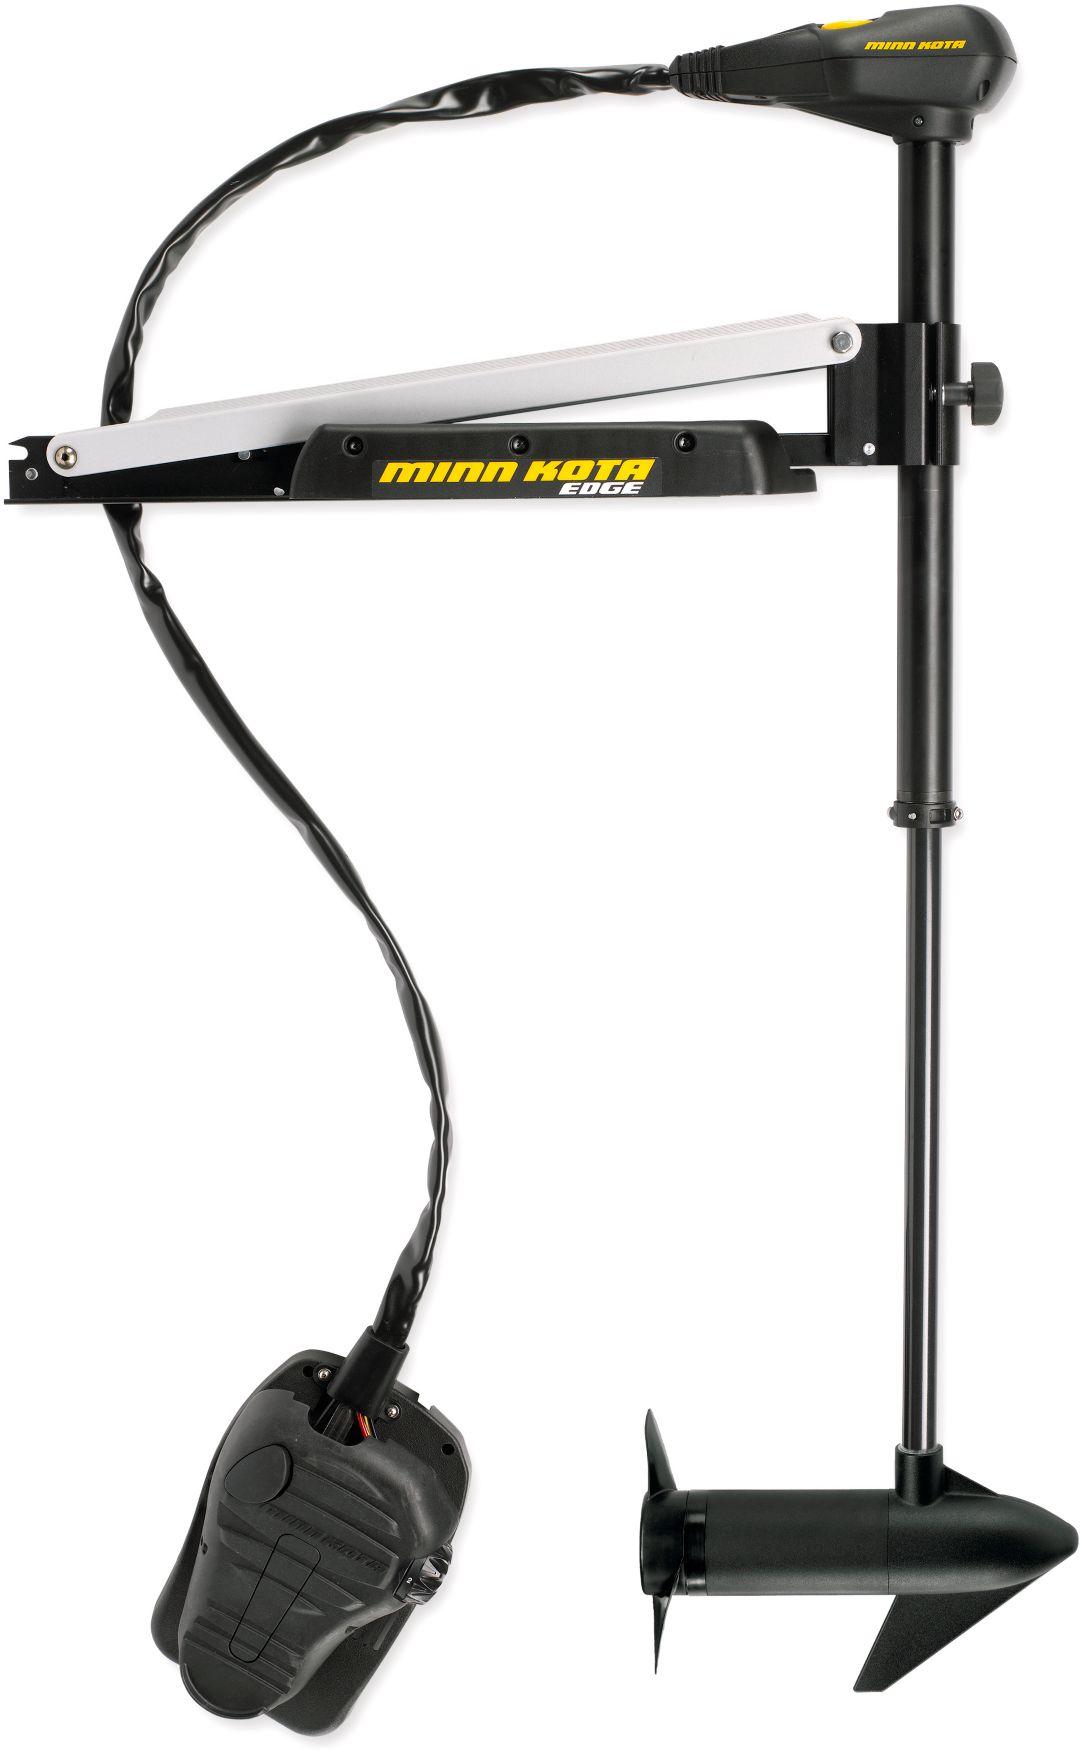 Minn Kota Edge Foot Mount Trolling Motor- 70 lb